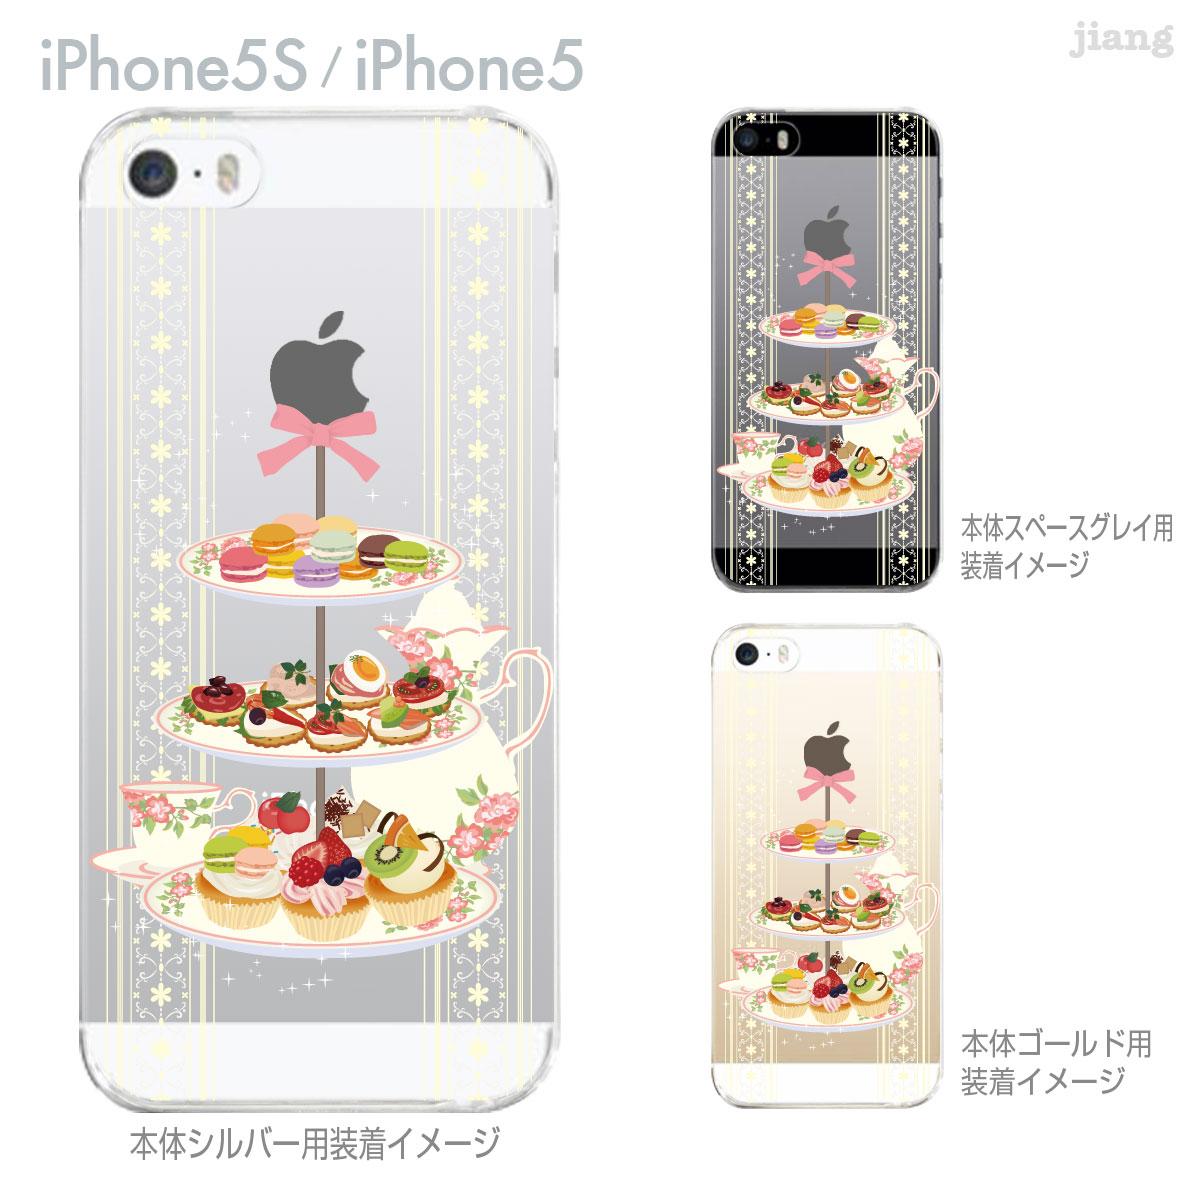 iPhone SE iPhone5s iPhone5 ケース スマホケース カバー クリア クリアケース ハードケース Clear Arts クリアーアーツ【アフタヌーンティー】 09-ip5s-ca0037